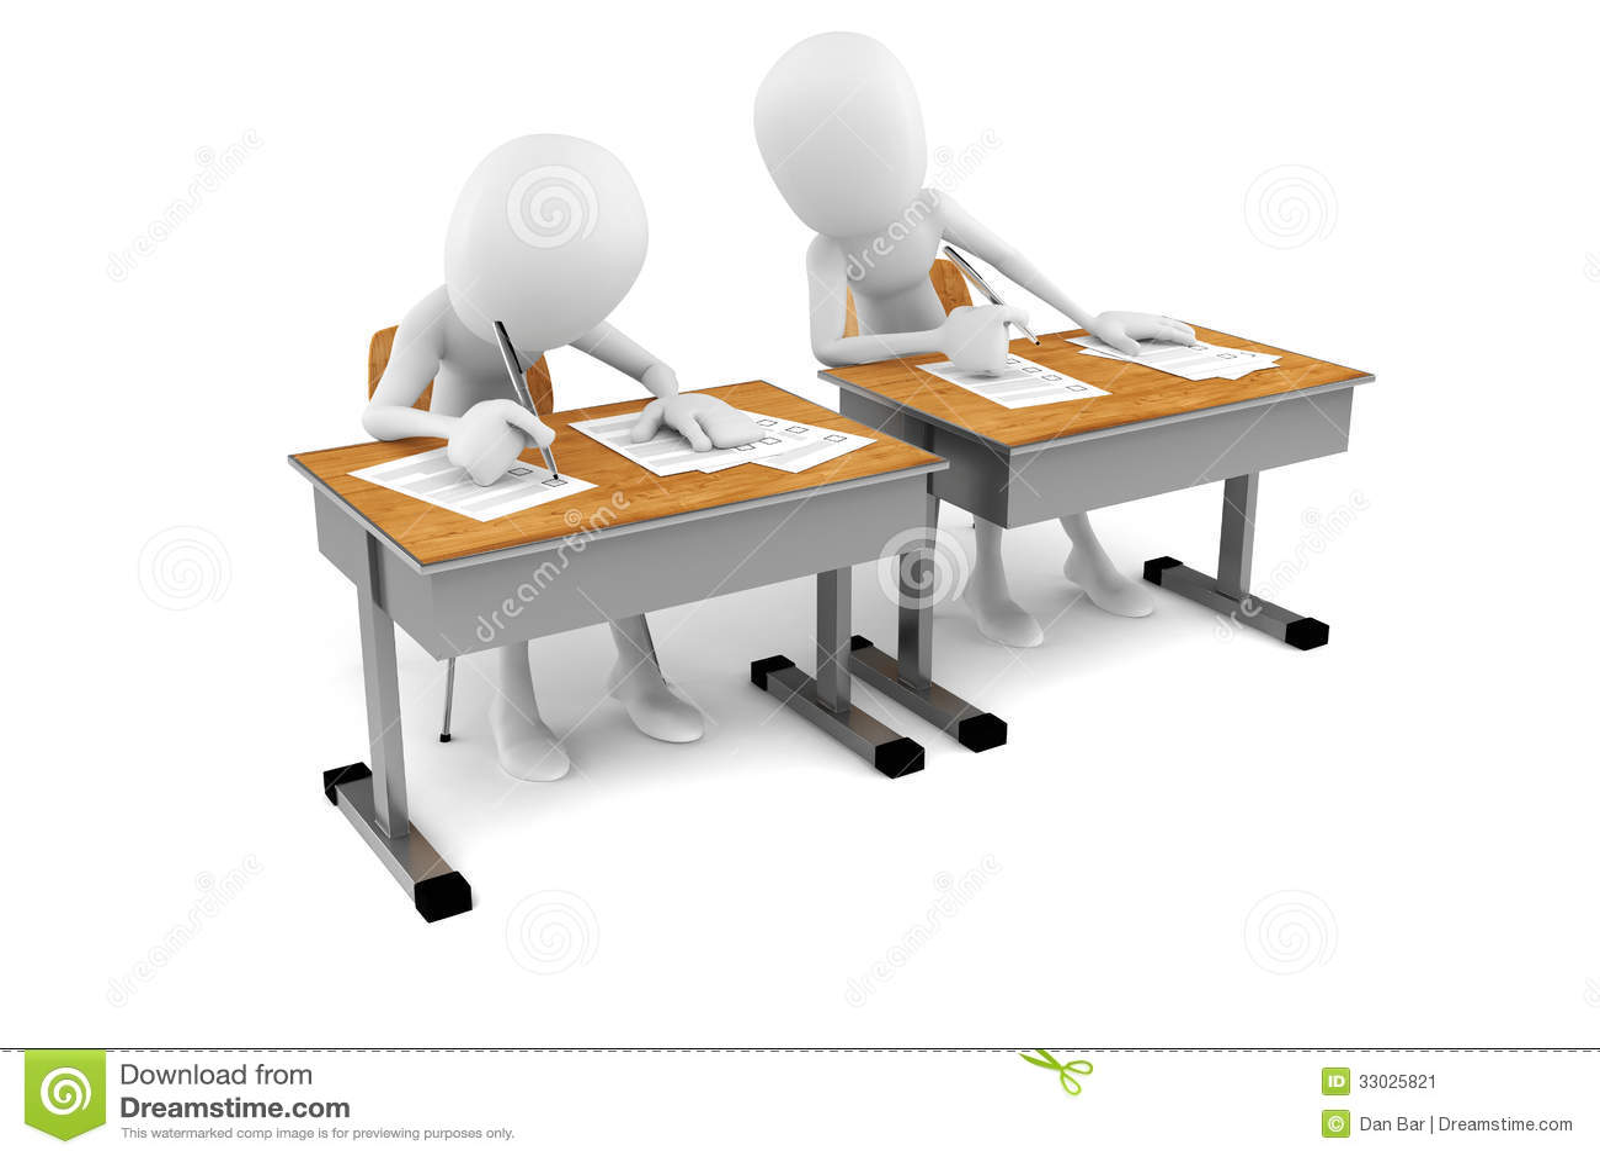 3d man in classroom exam test stock illustration illustration of pencil knowledge 33025821. Black Bedroom Furniture Sets. Home Design Ideas